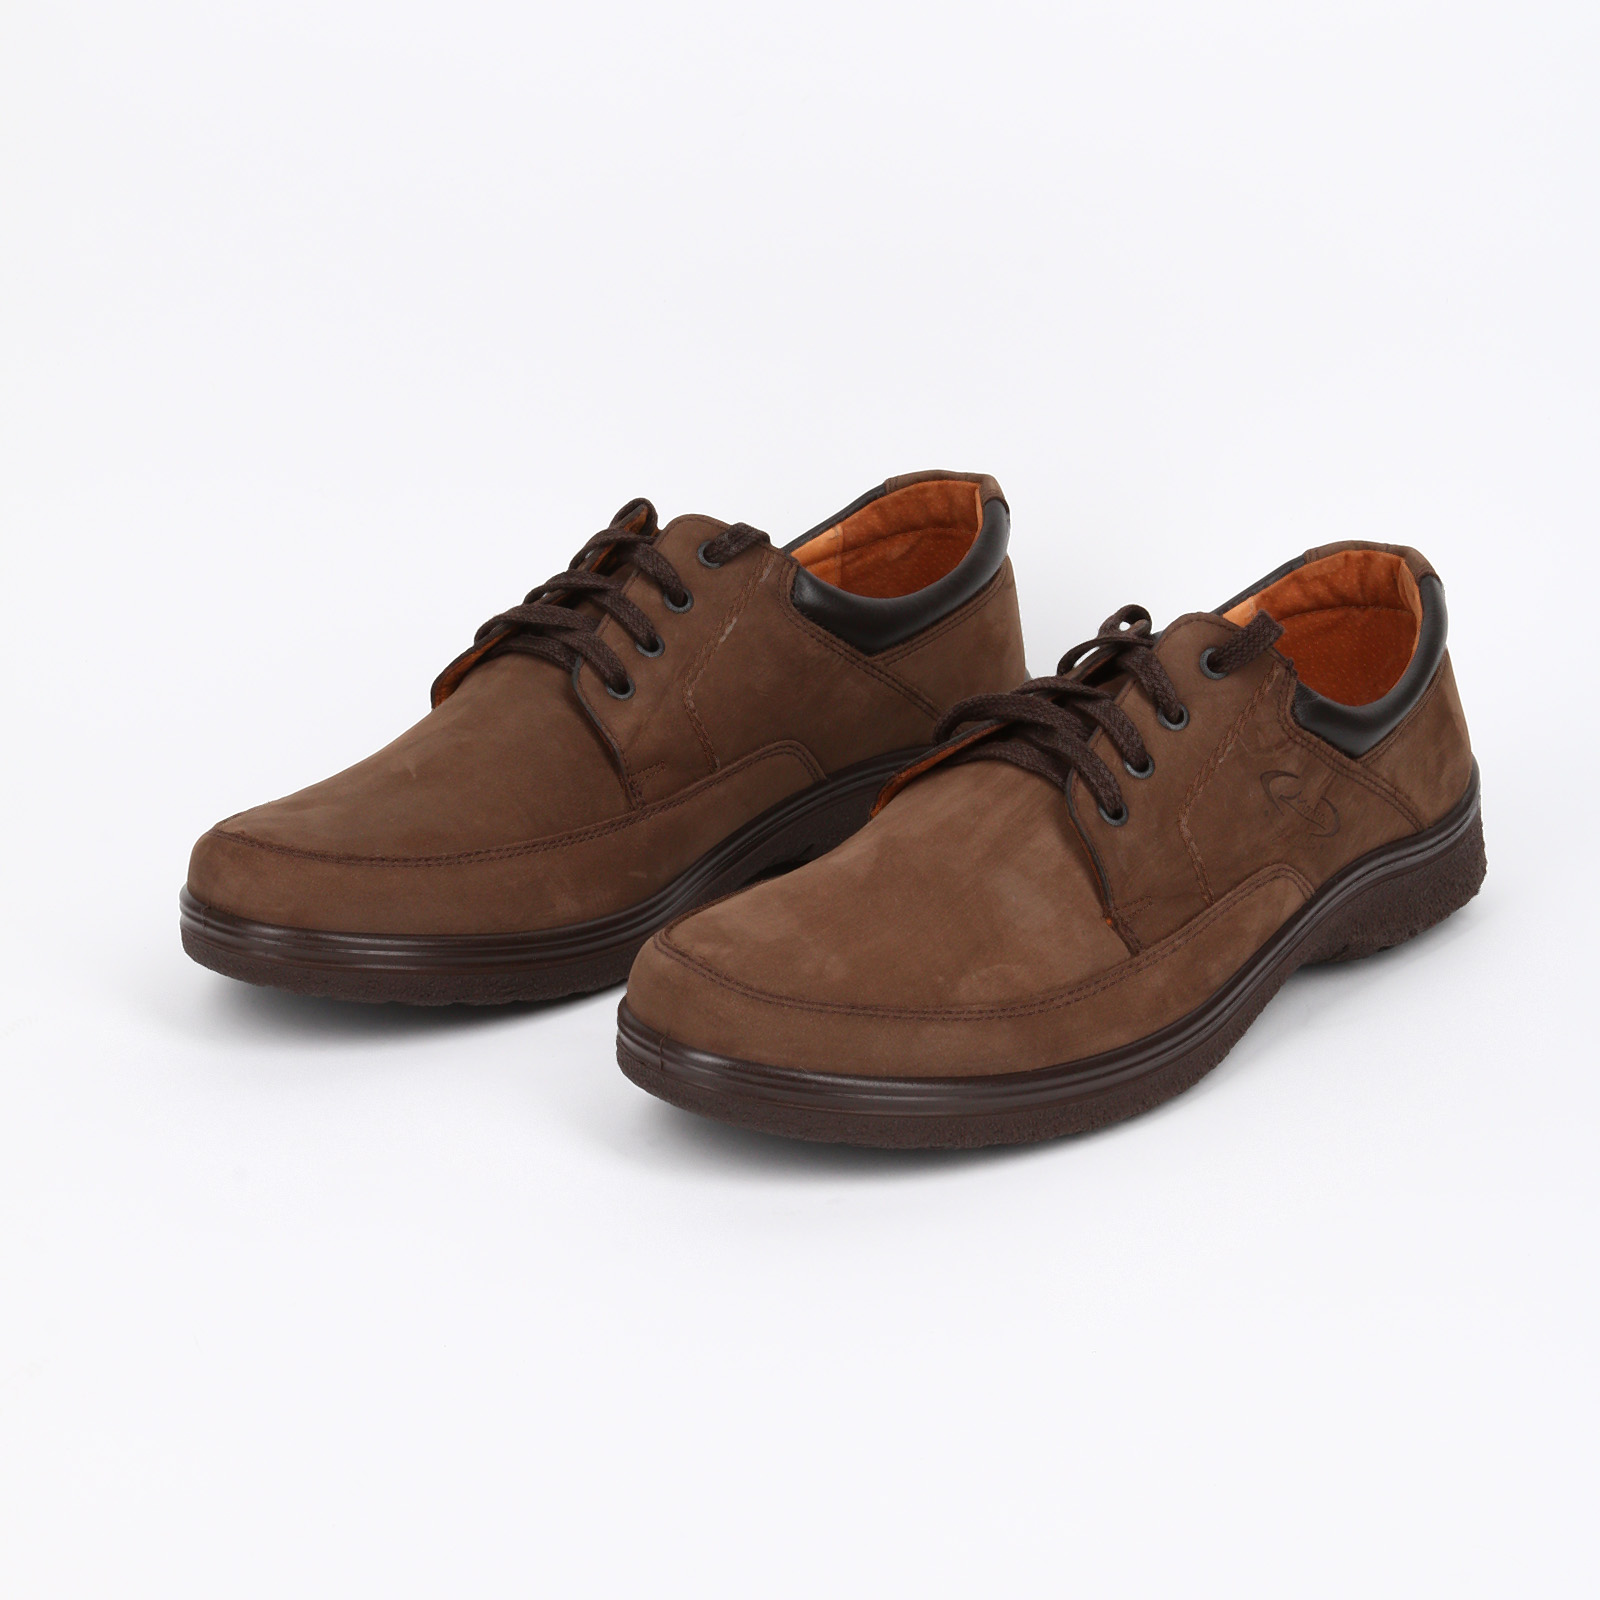 Полуботинки мужские на шнурках